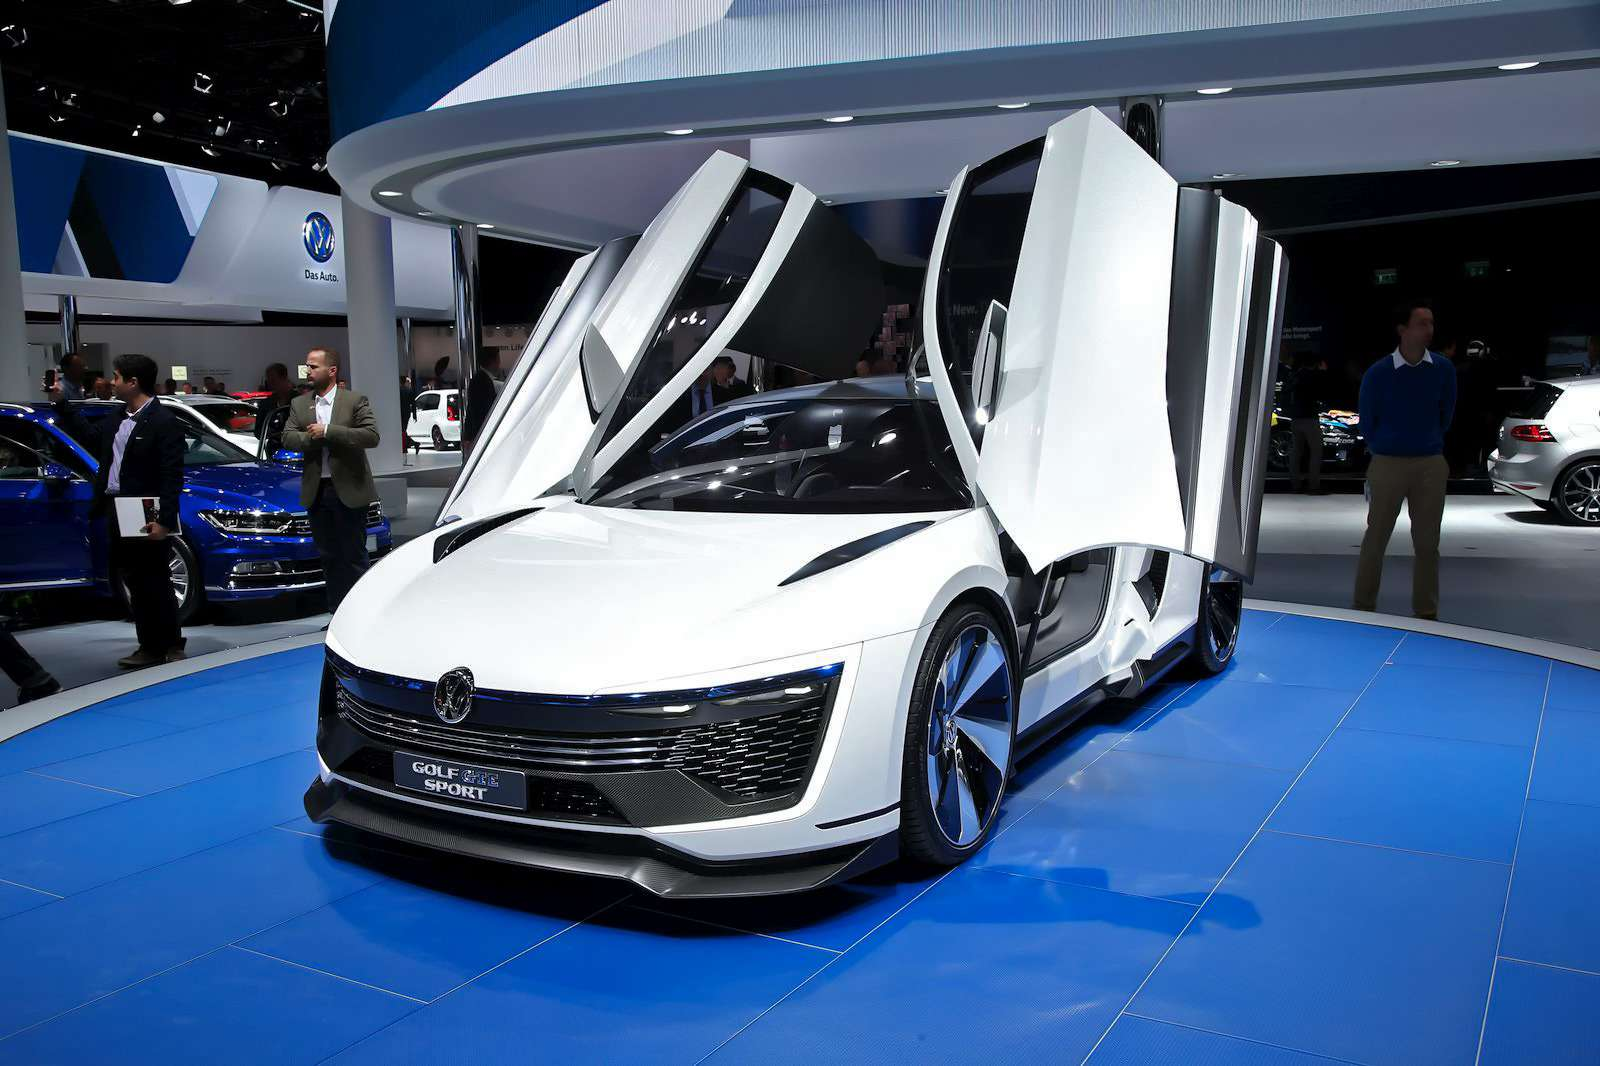 VW_Golf_GTE_Sport_1